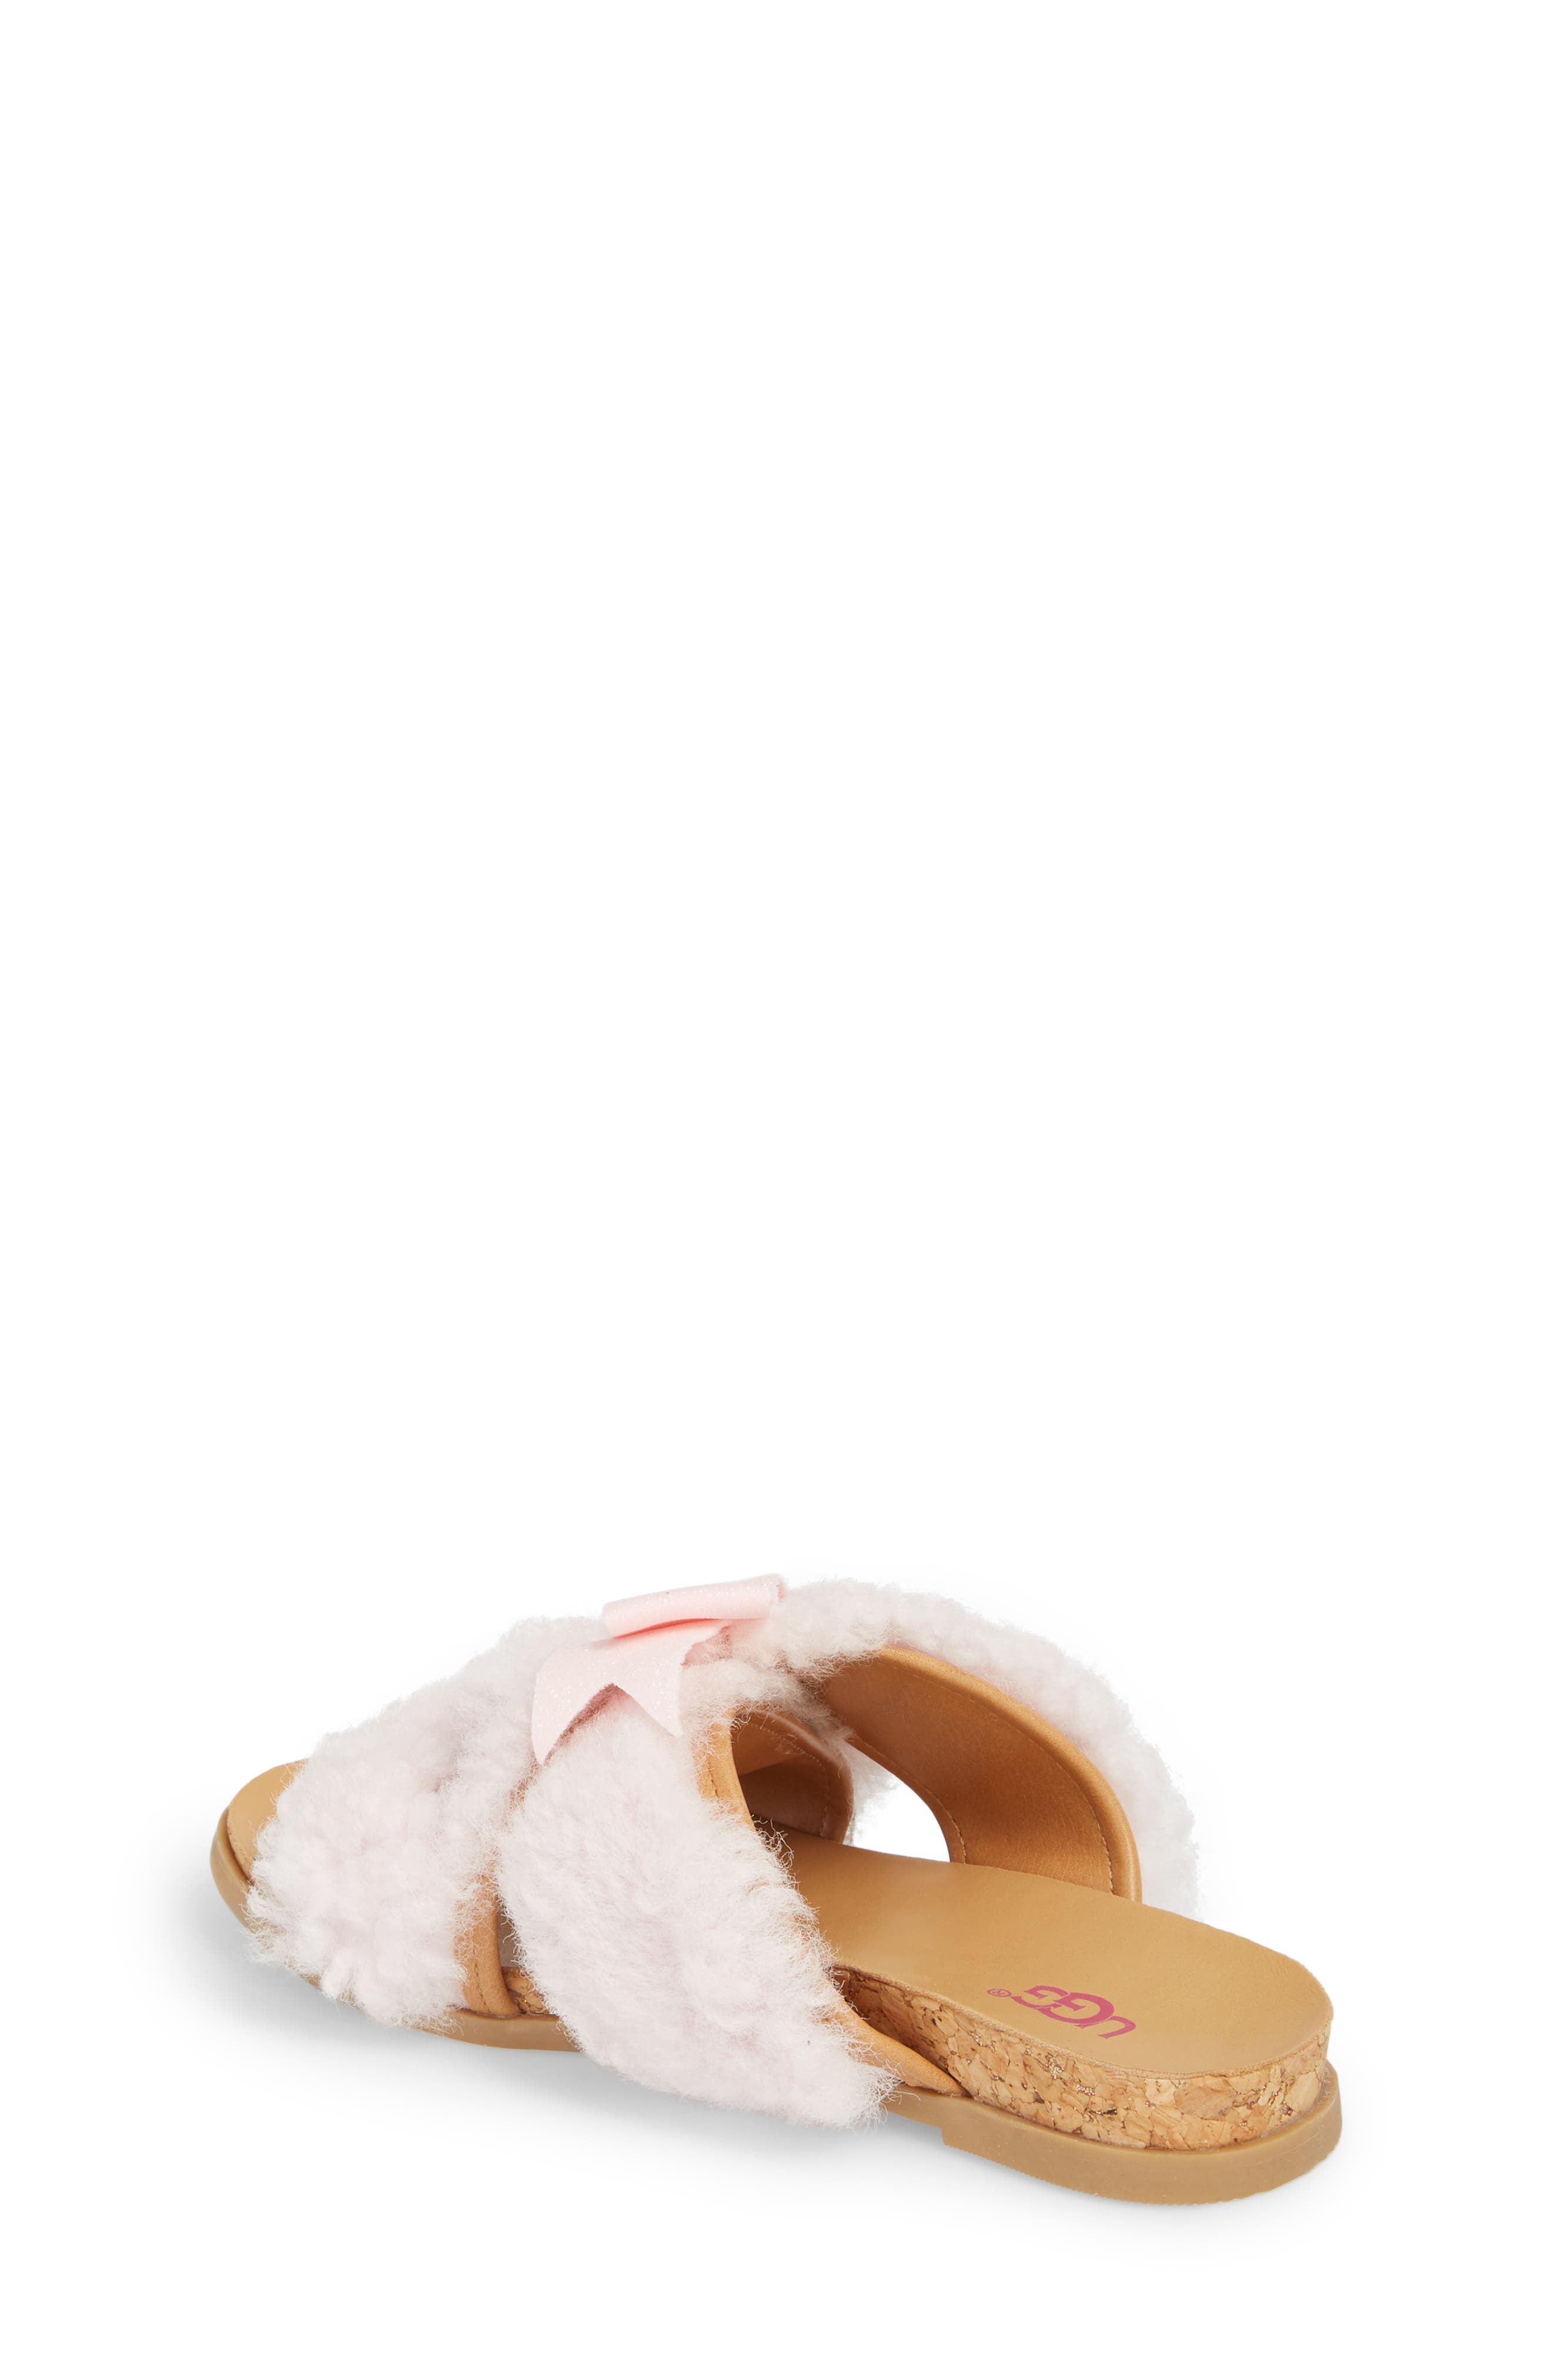 Staceee Genuine Shearling Slide Sandal,                             Alternate thumbnail 2, color,                             Seashell Pink